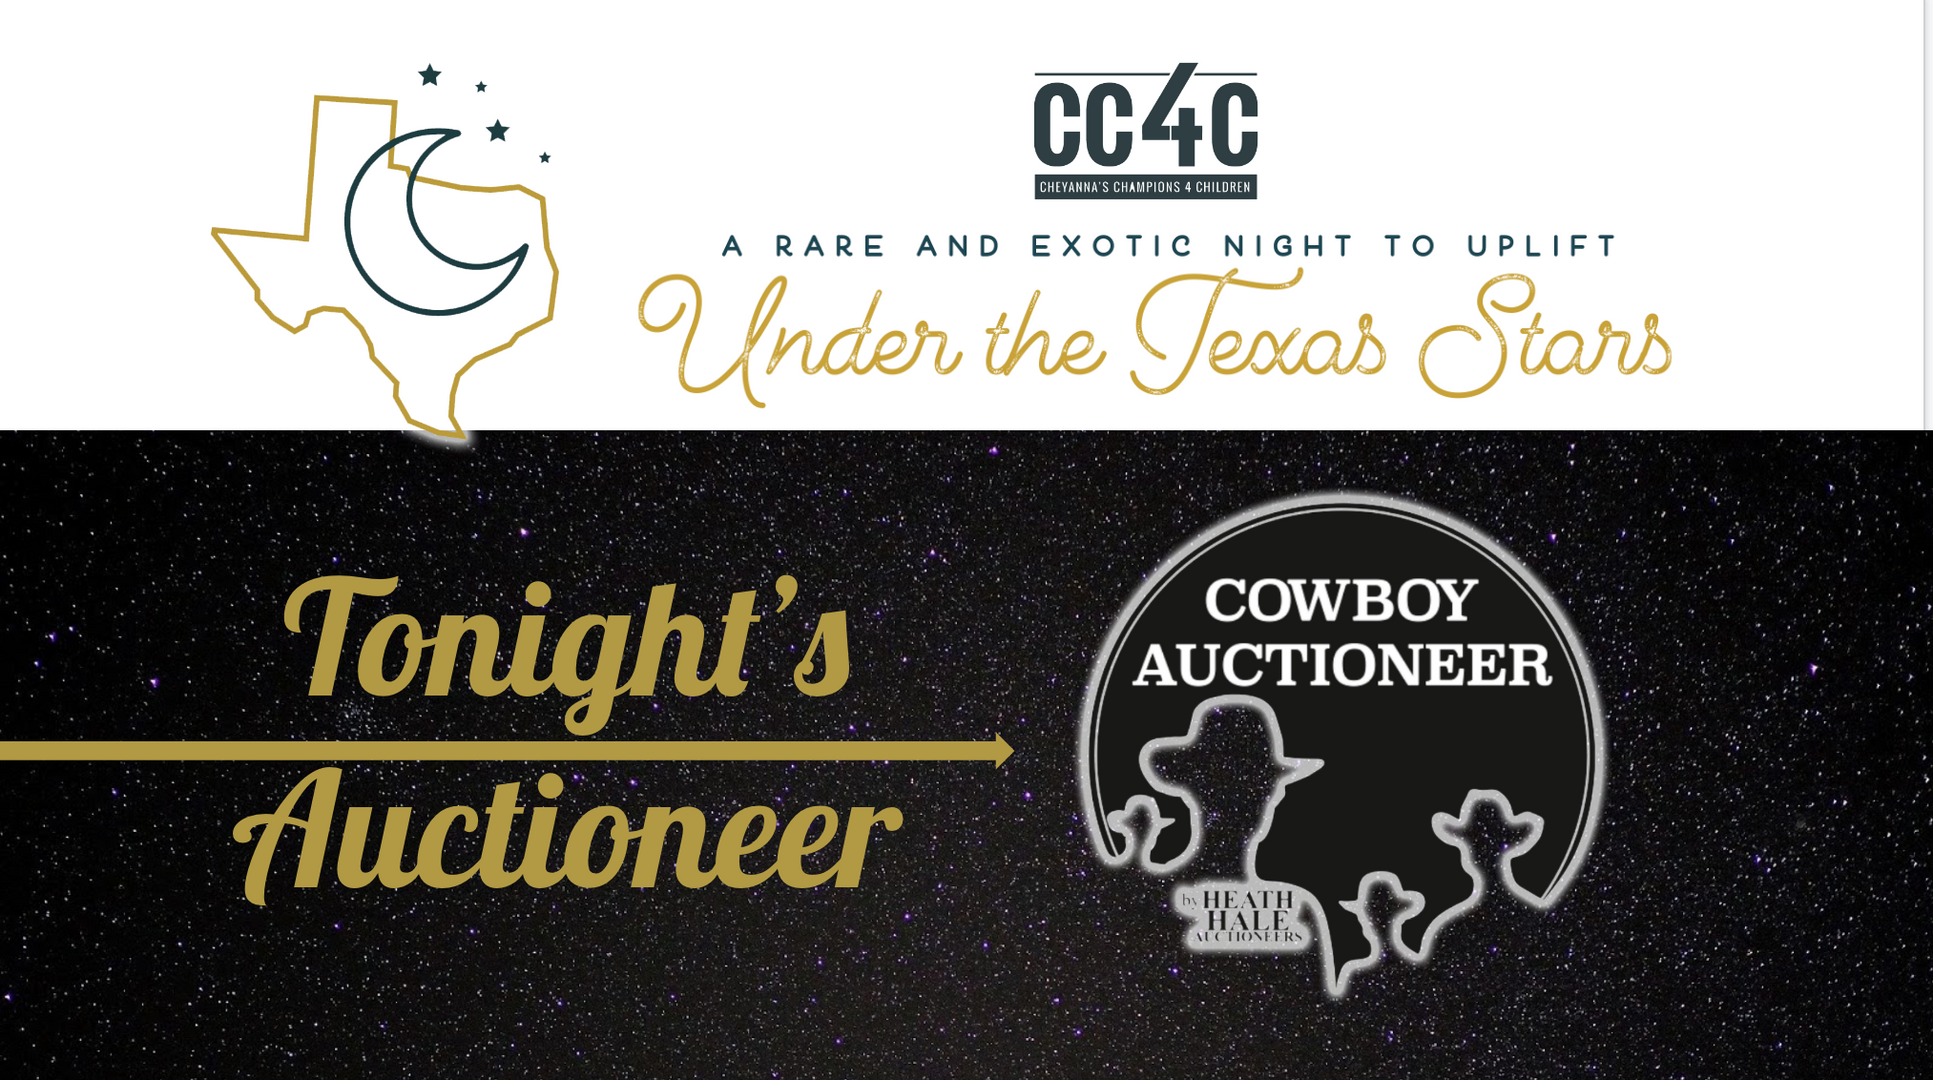 Night 2 Uplift Auction Slide